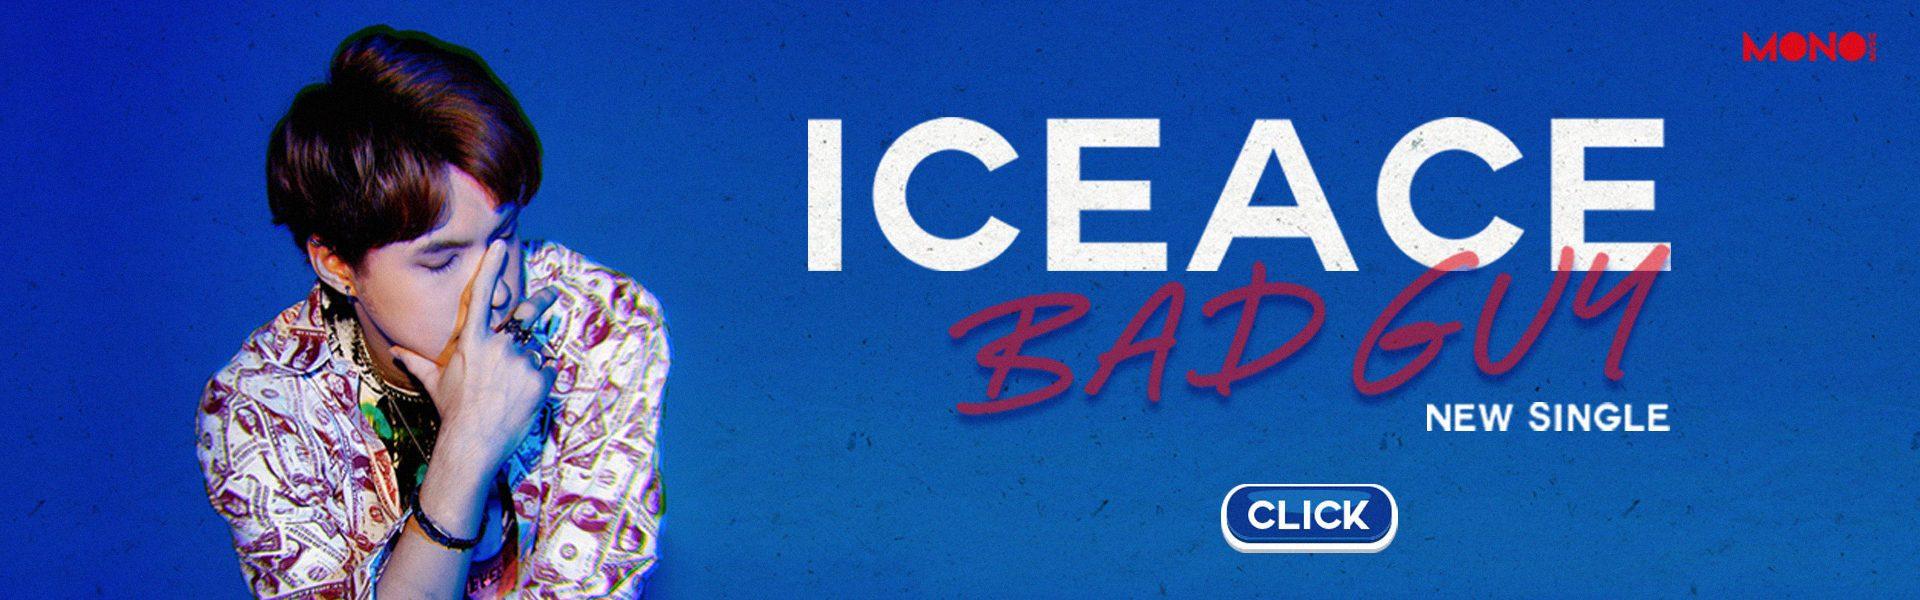 BAD GUY - ICEACE [Lyrics Video]